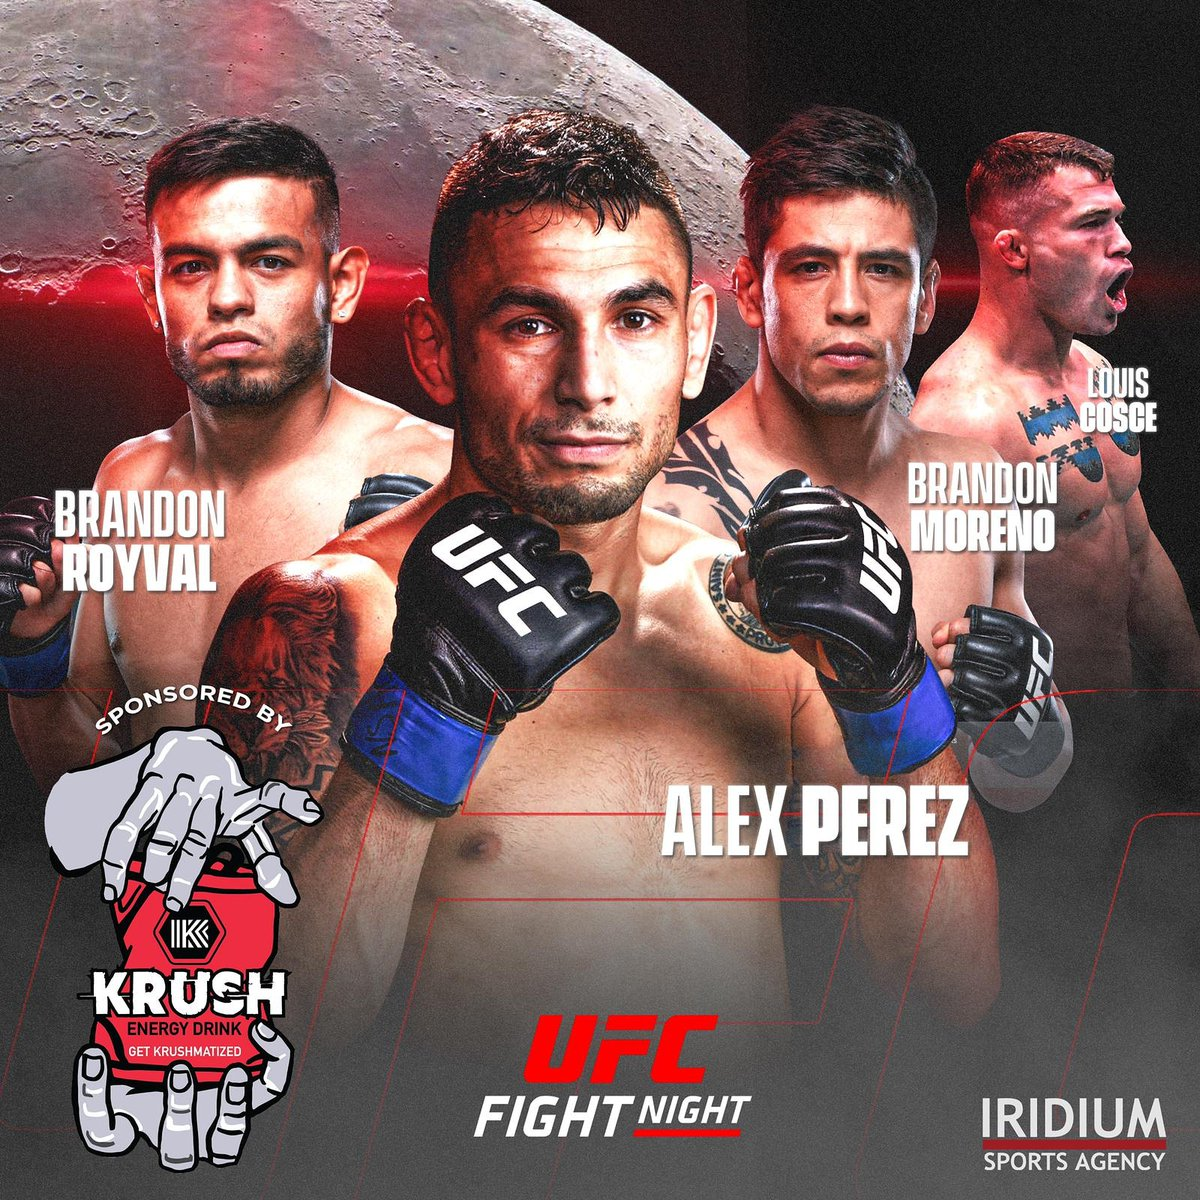 🚨 #TeamIridium monsters @louiscosce707, @theassassinbaby, @alexperezMMA & @brandonroyval enter the @ufc's Octagon at #UFC255 😈 #TheDarkside https://t.co/YdzTNaYVv0